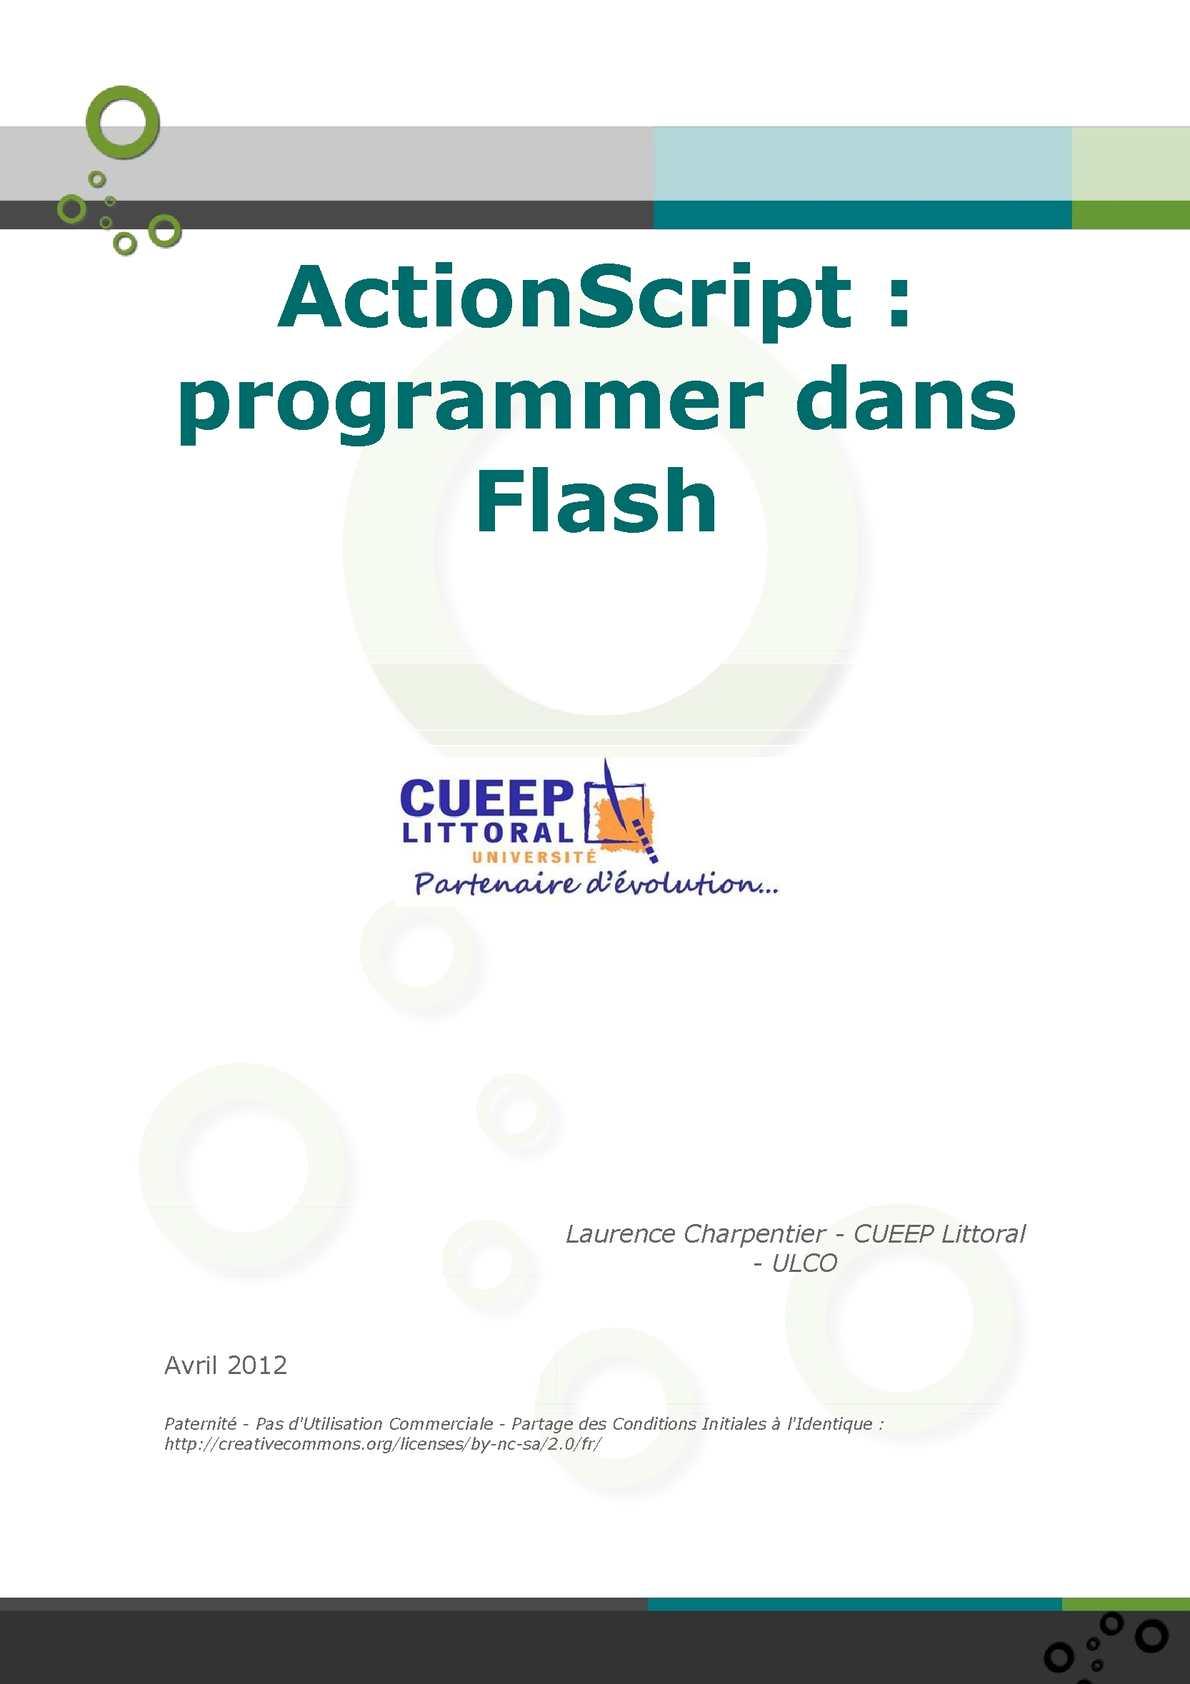 Adobe Flash : ActionScript